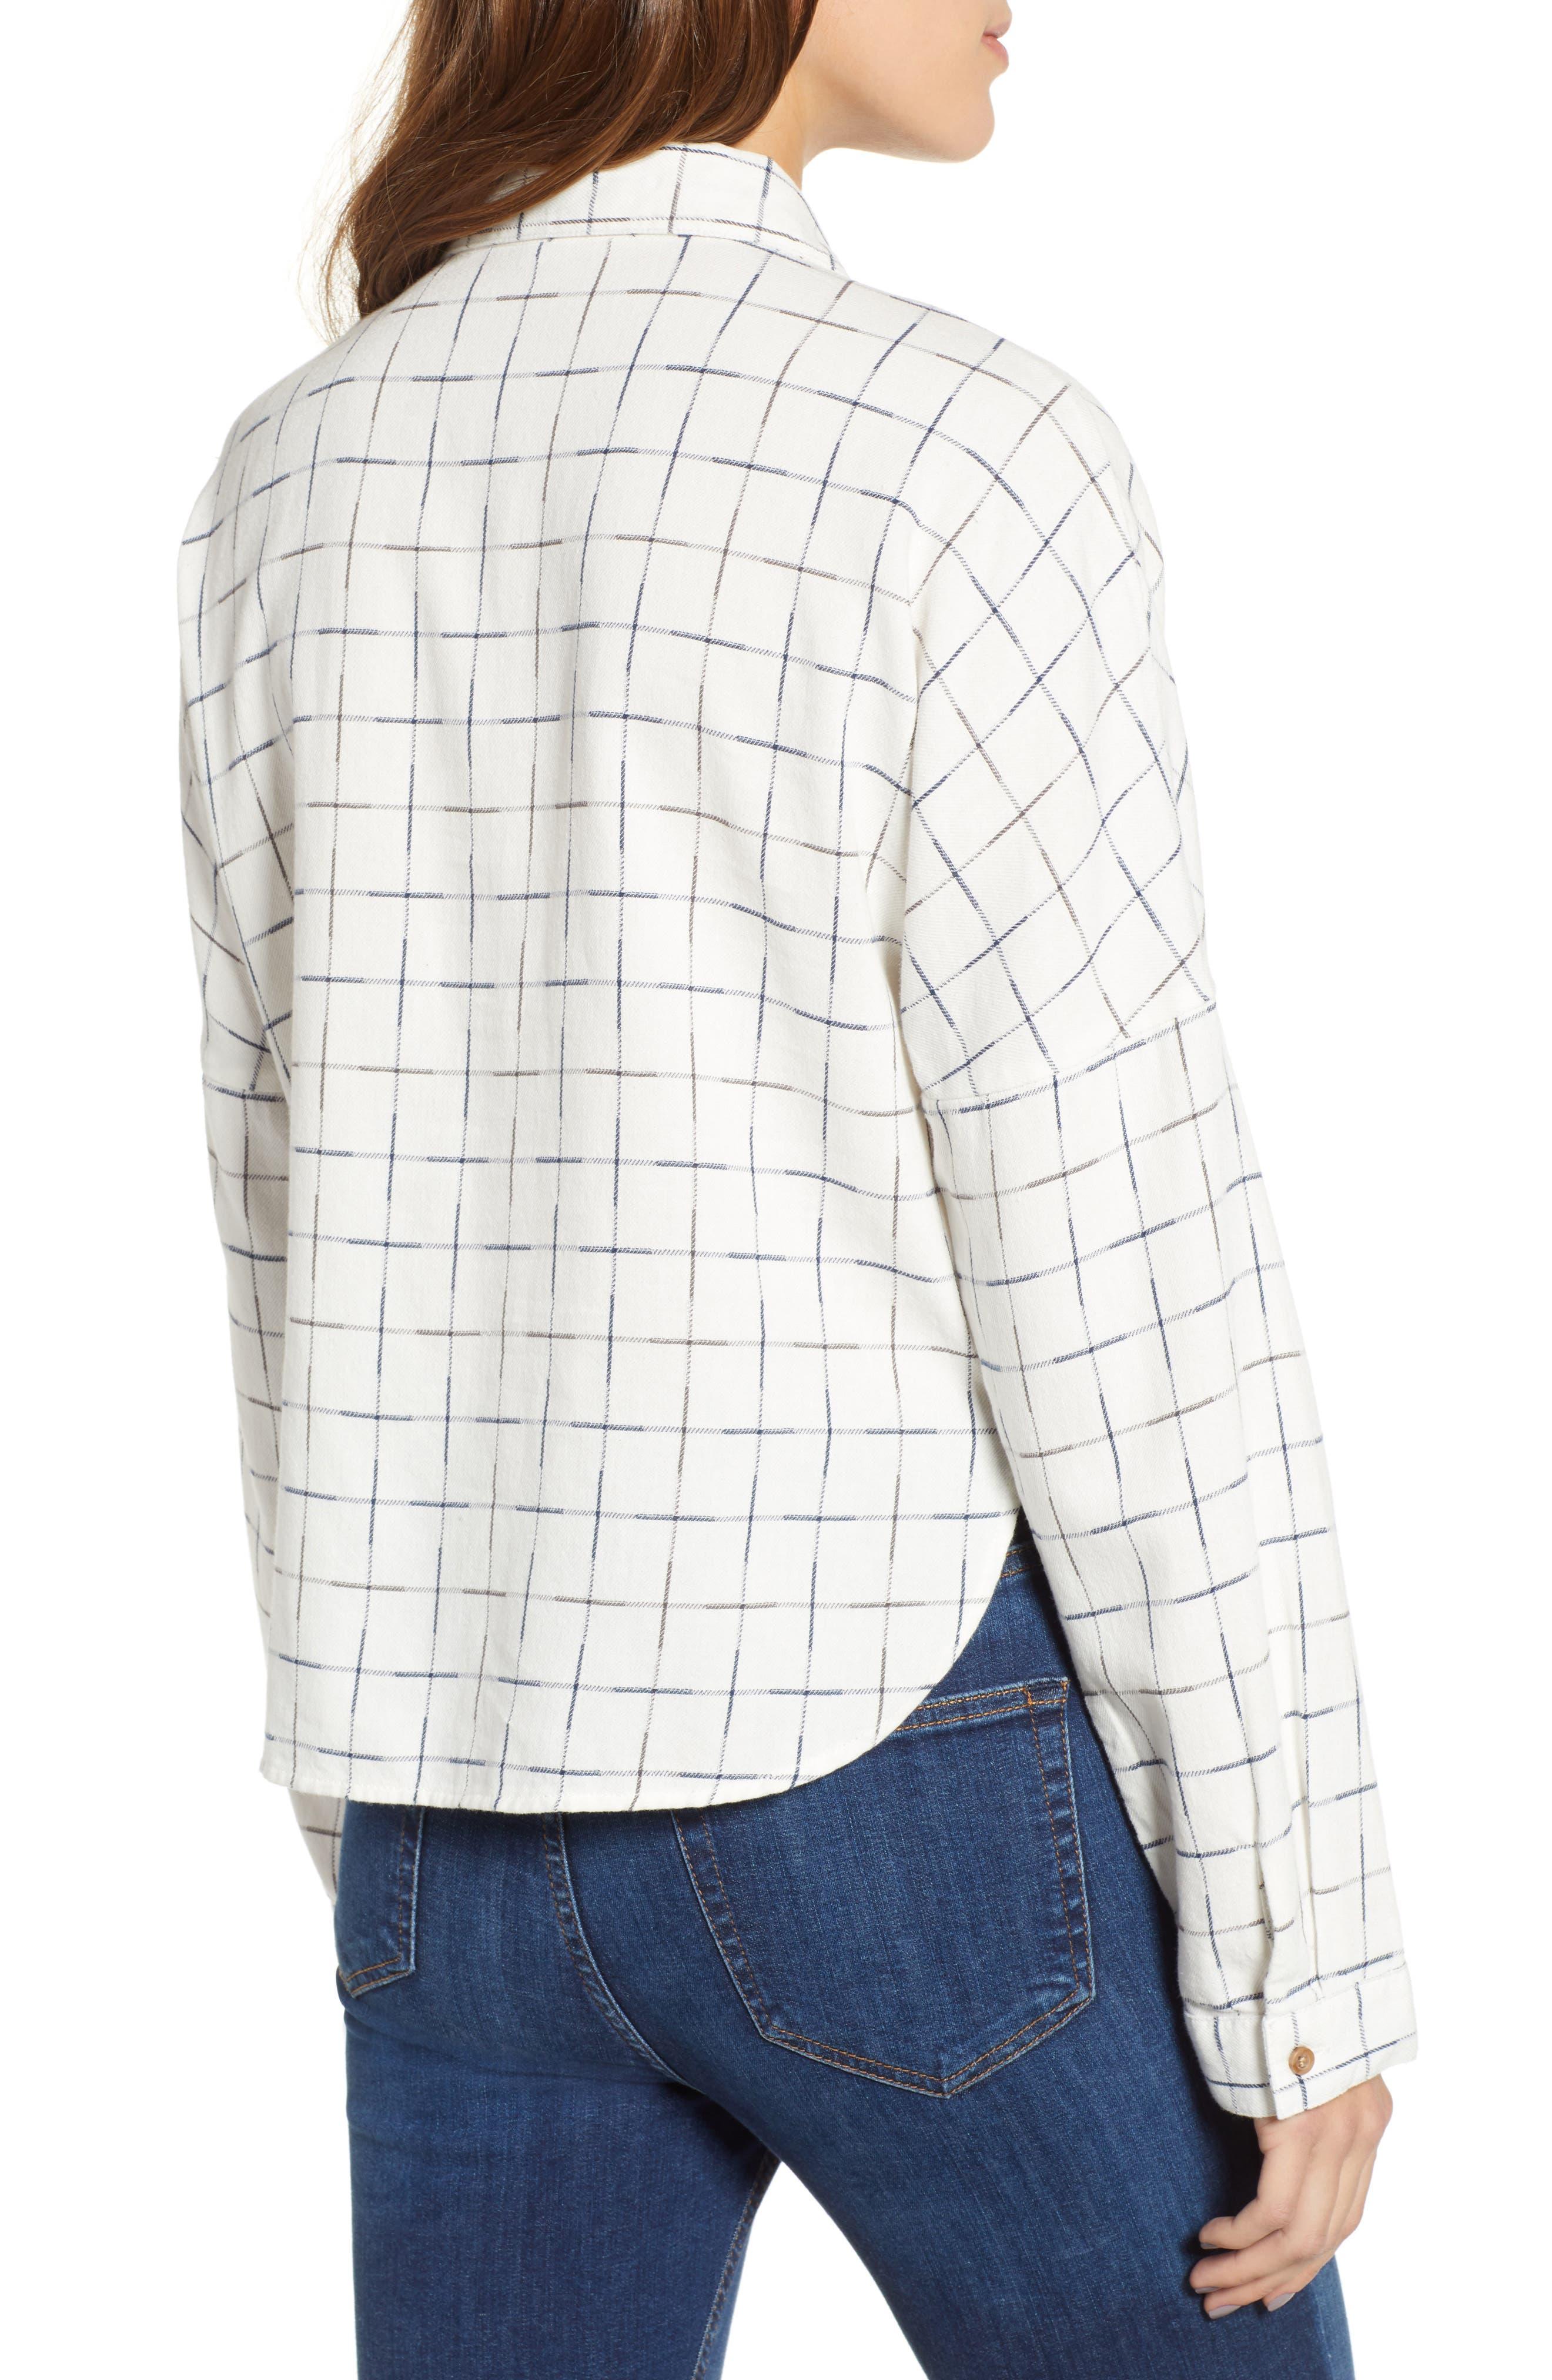 Check Flannel Shirt,                             Alternate thumbnail 2, color,                             NAVY/ WHITE GRID